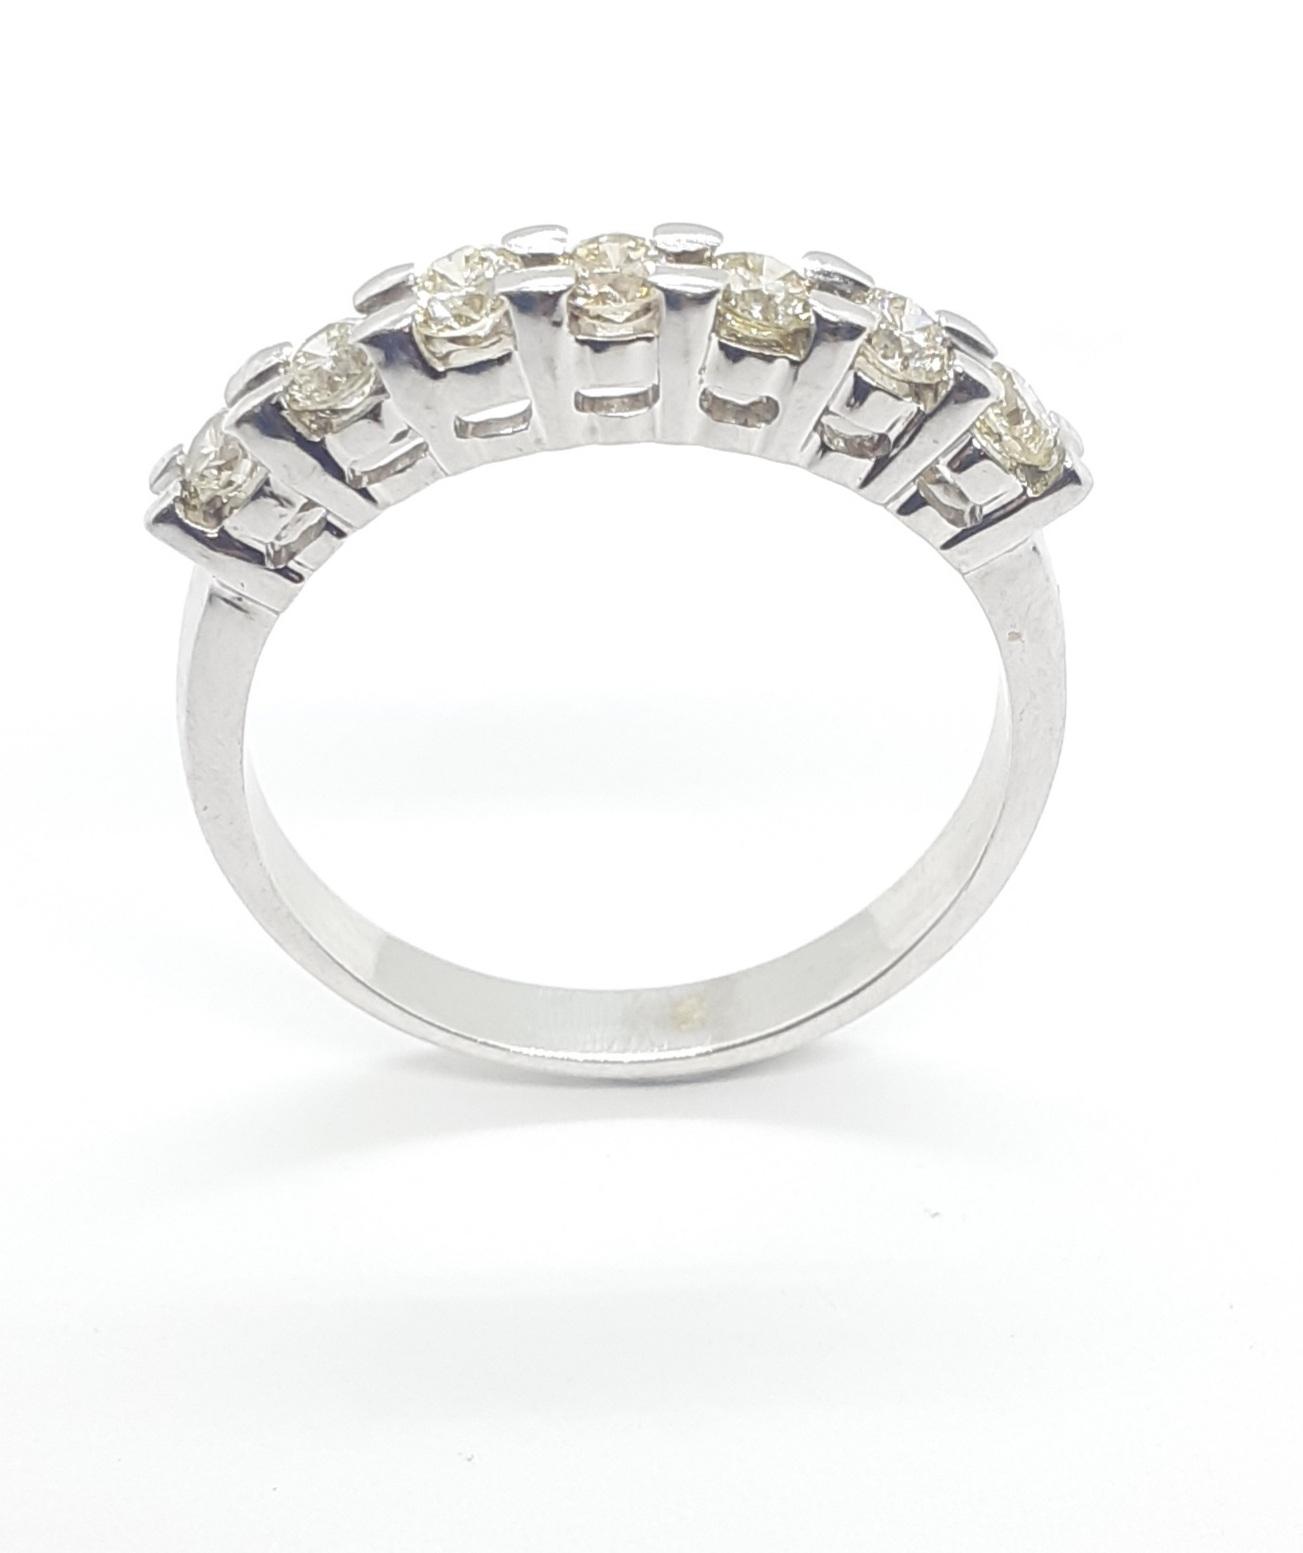 Sensi joyas alta joyería Granada plata compromiso ANILLO ORO 18K  BRILLANTES  0,56 CTS